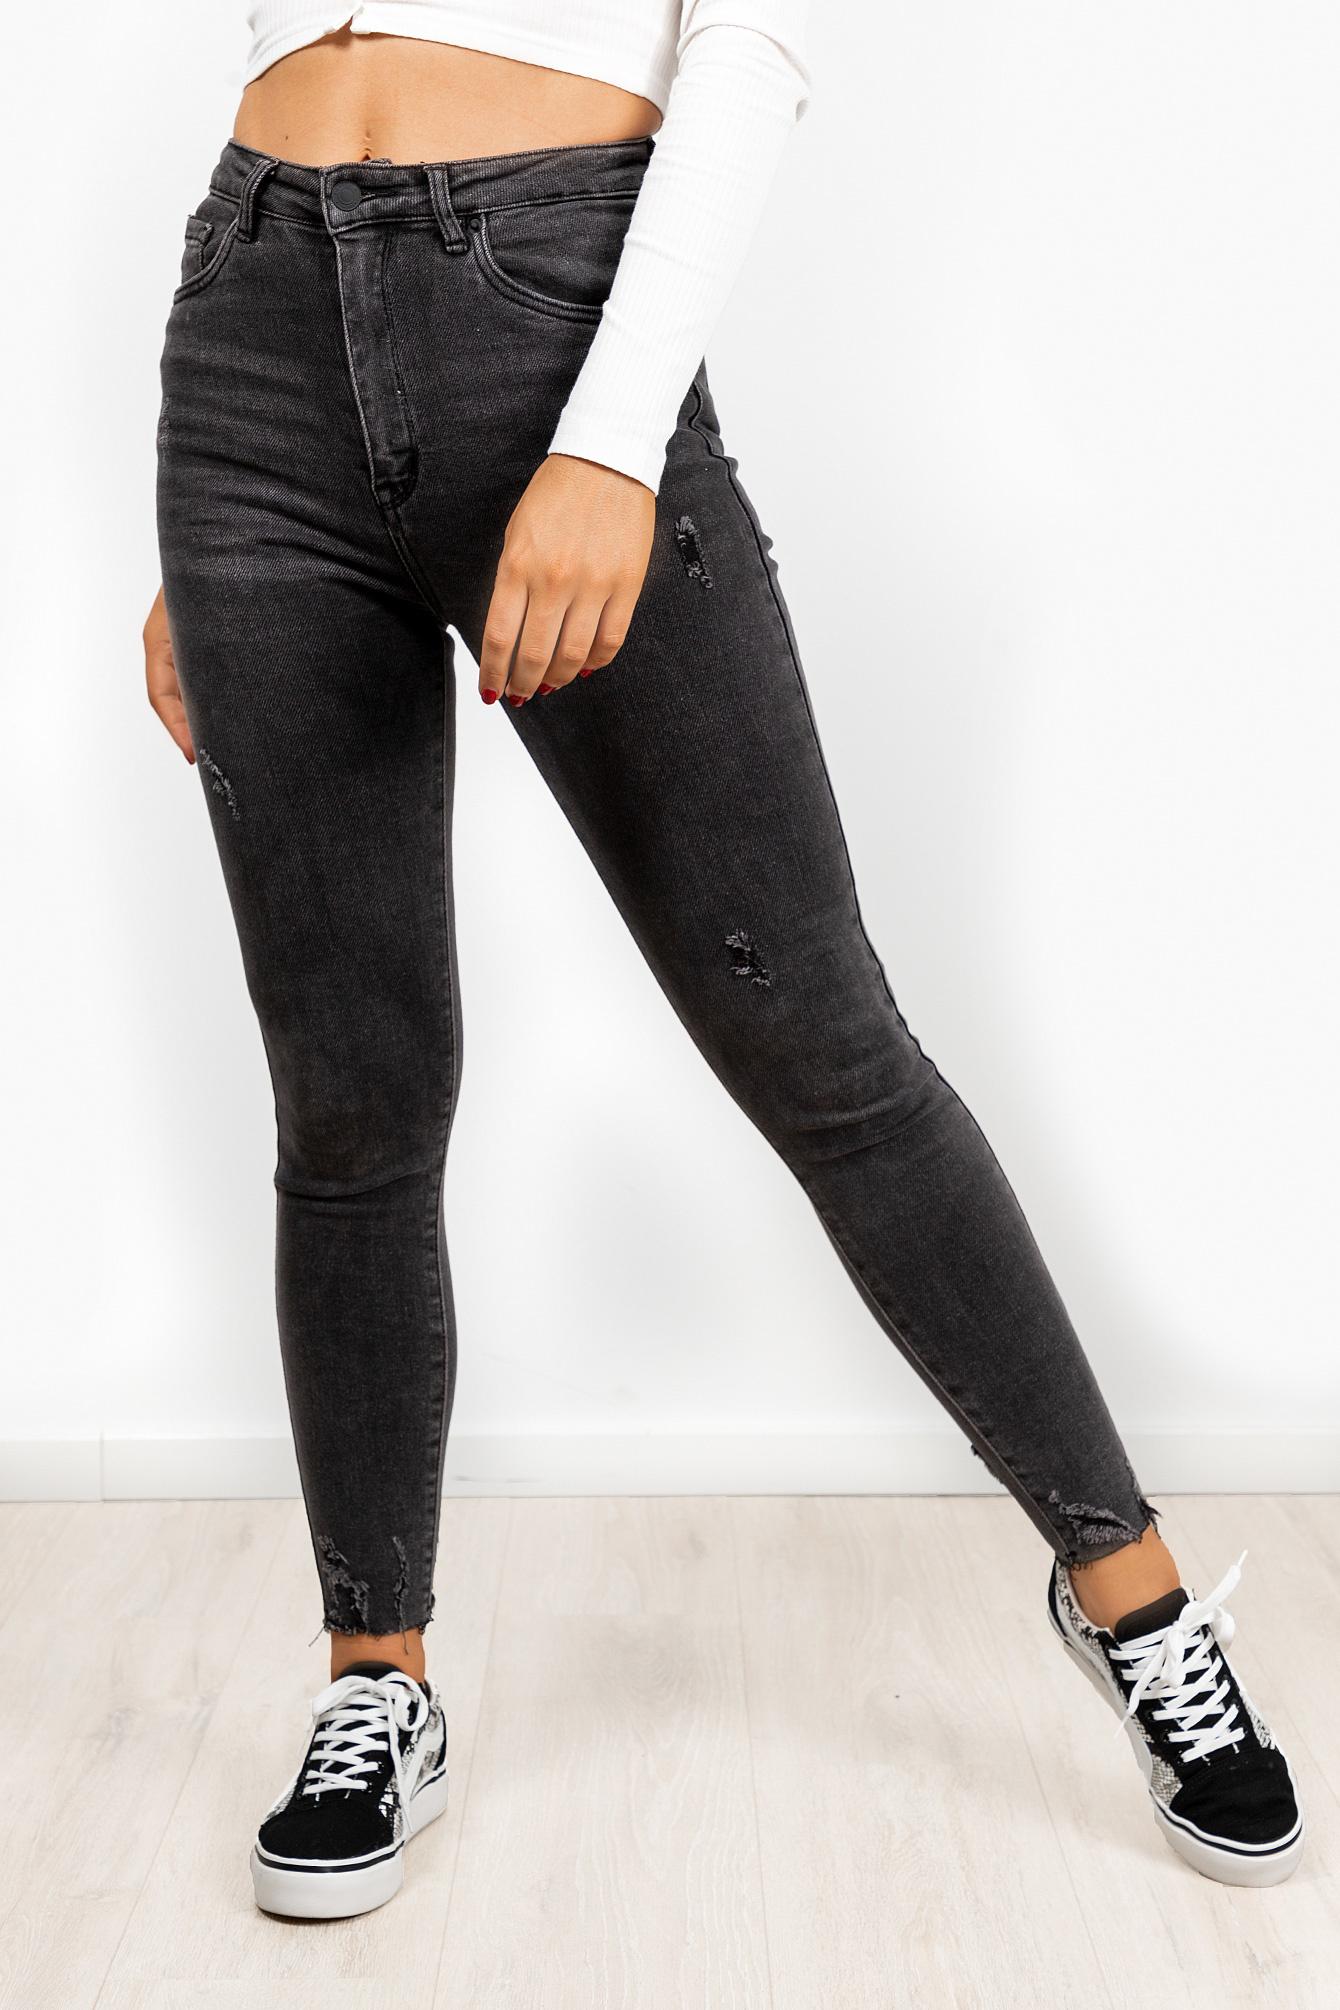 Denims jeans Joelle donkergrijs